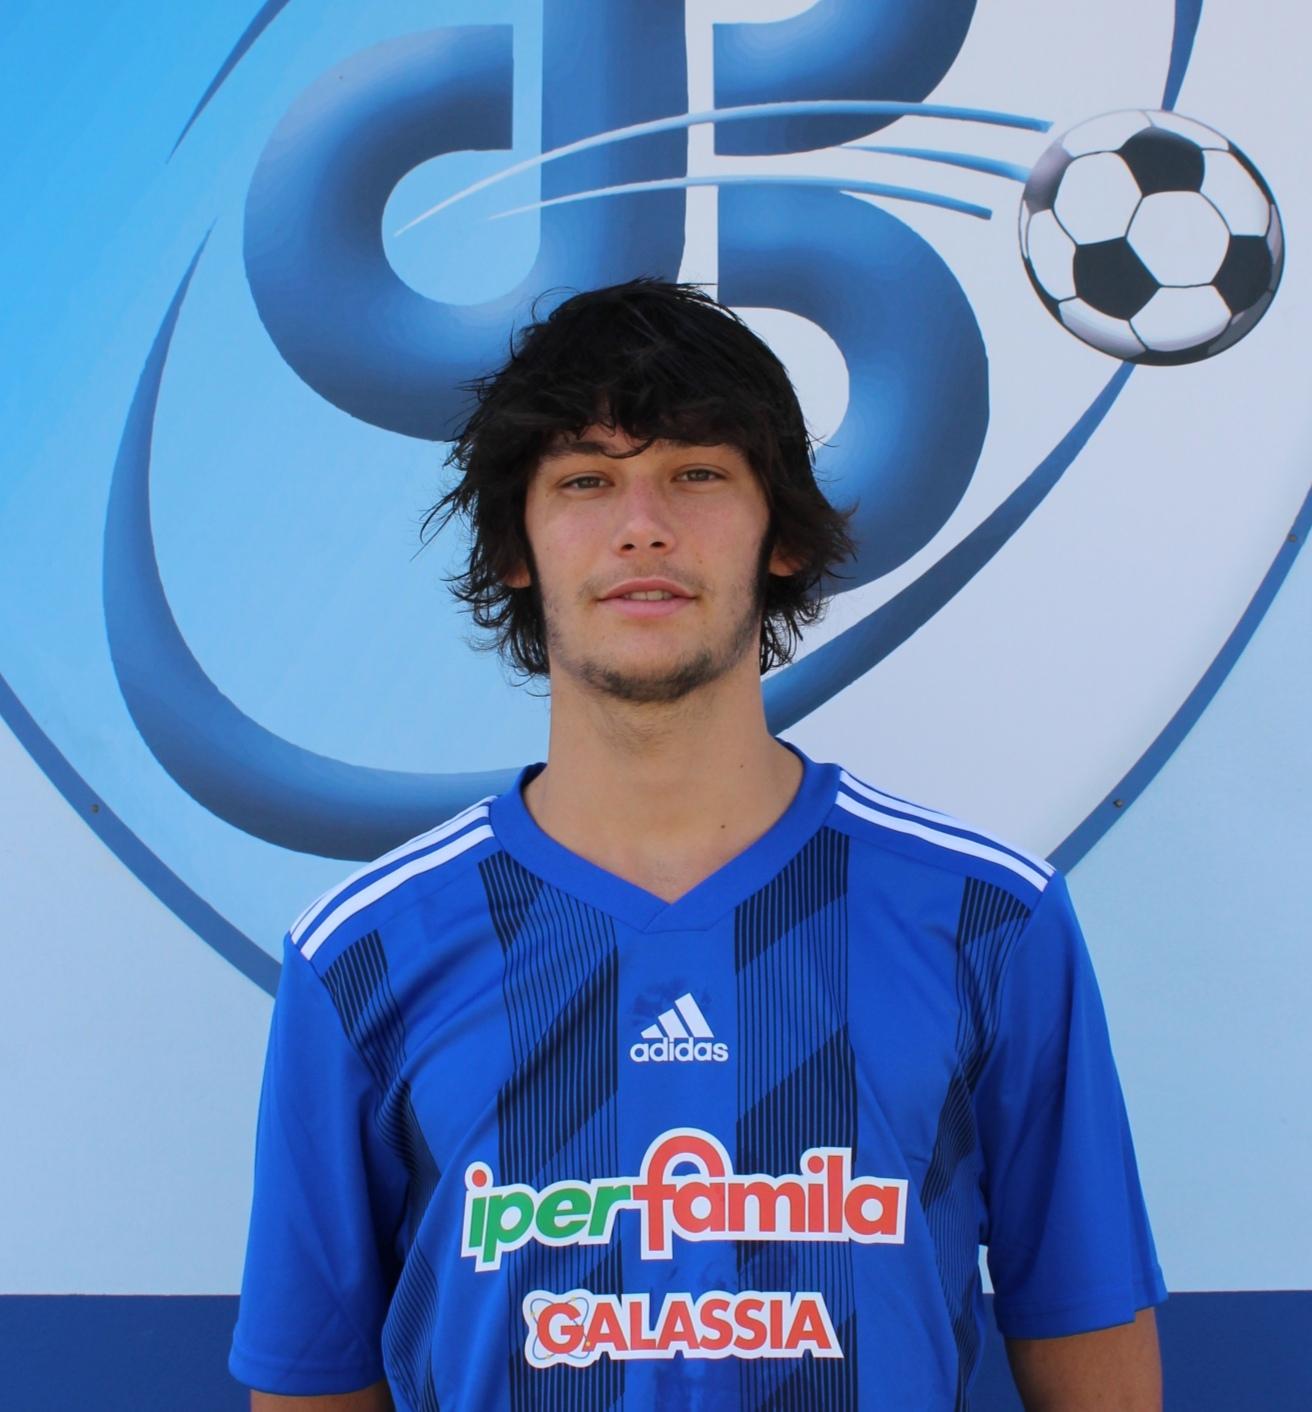 FAEDO Carlo